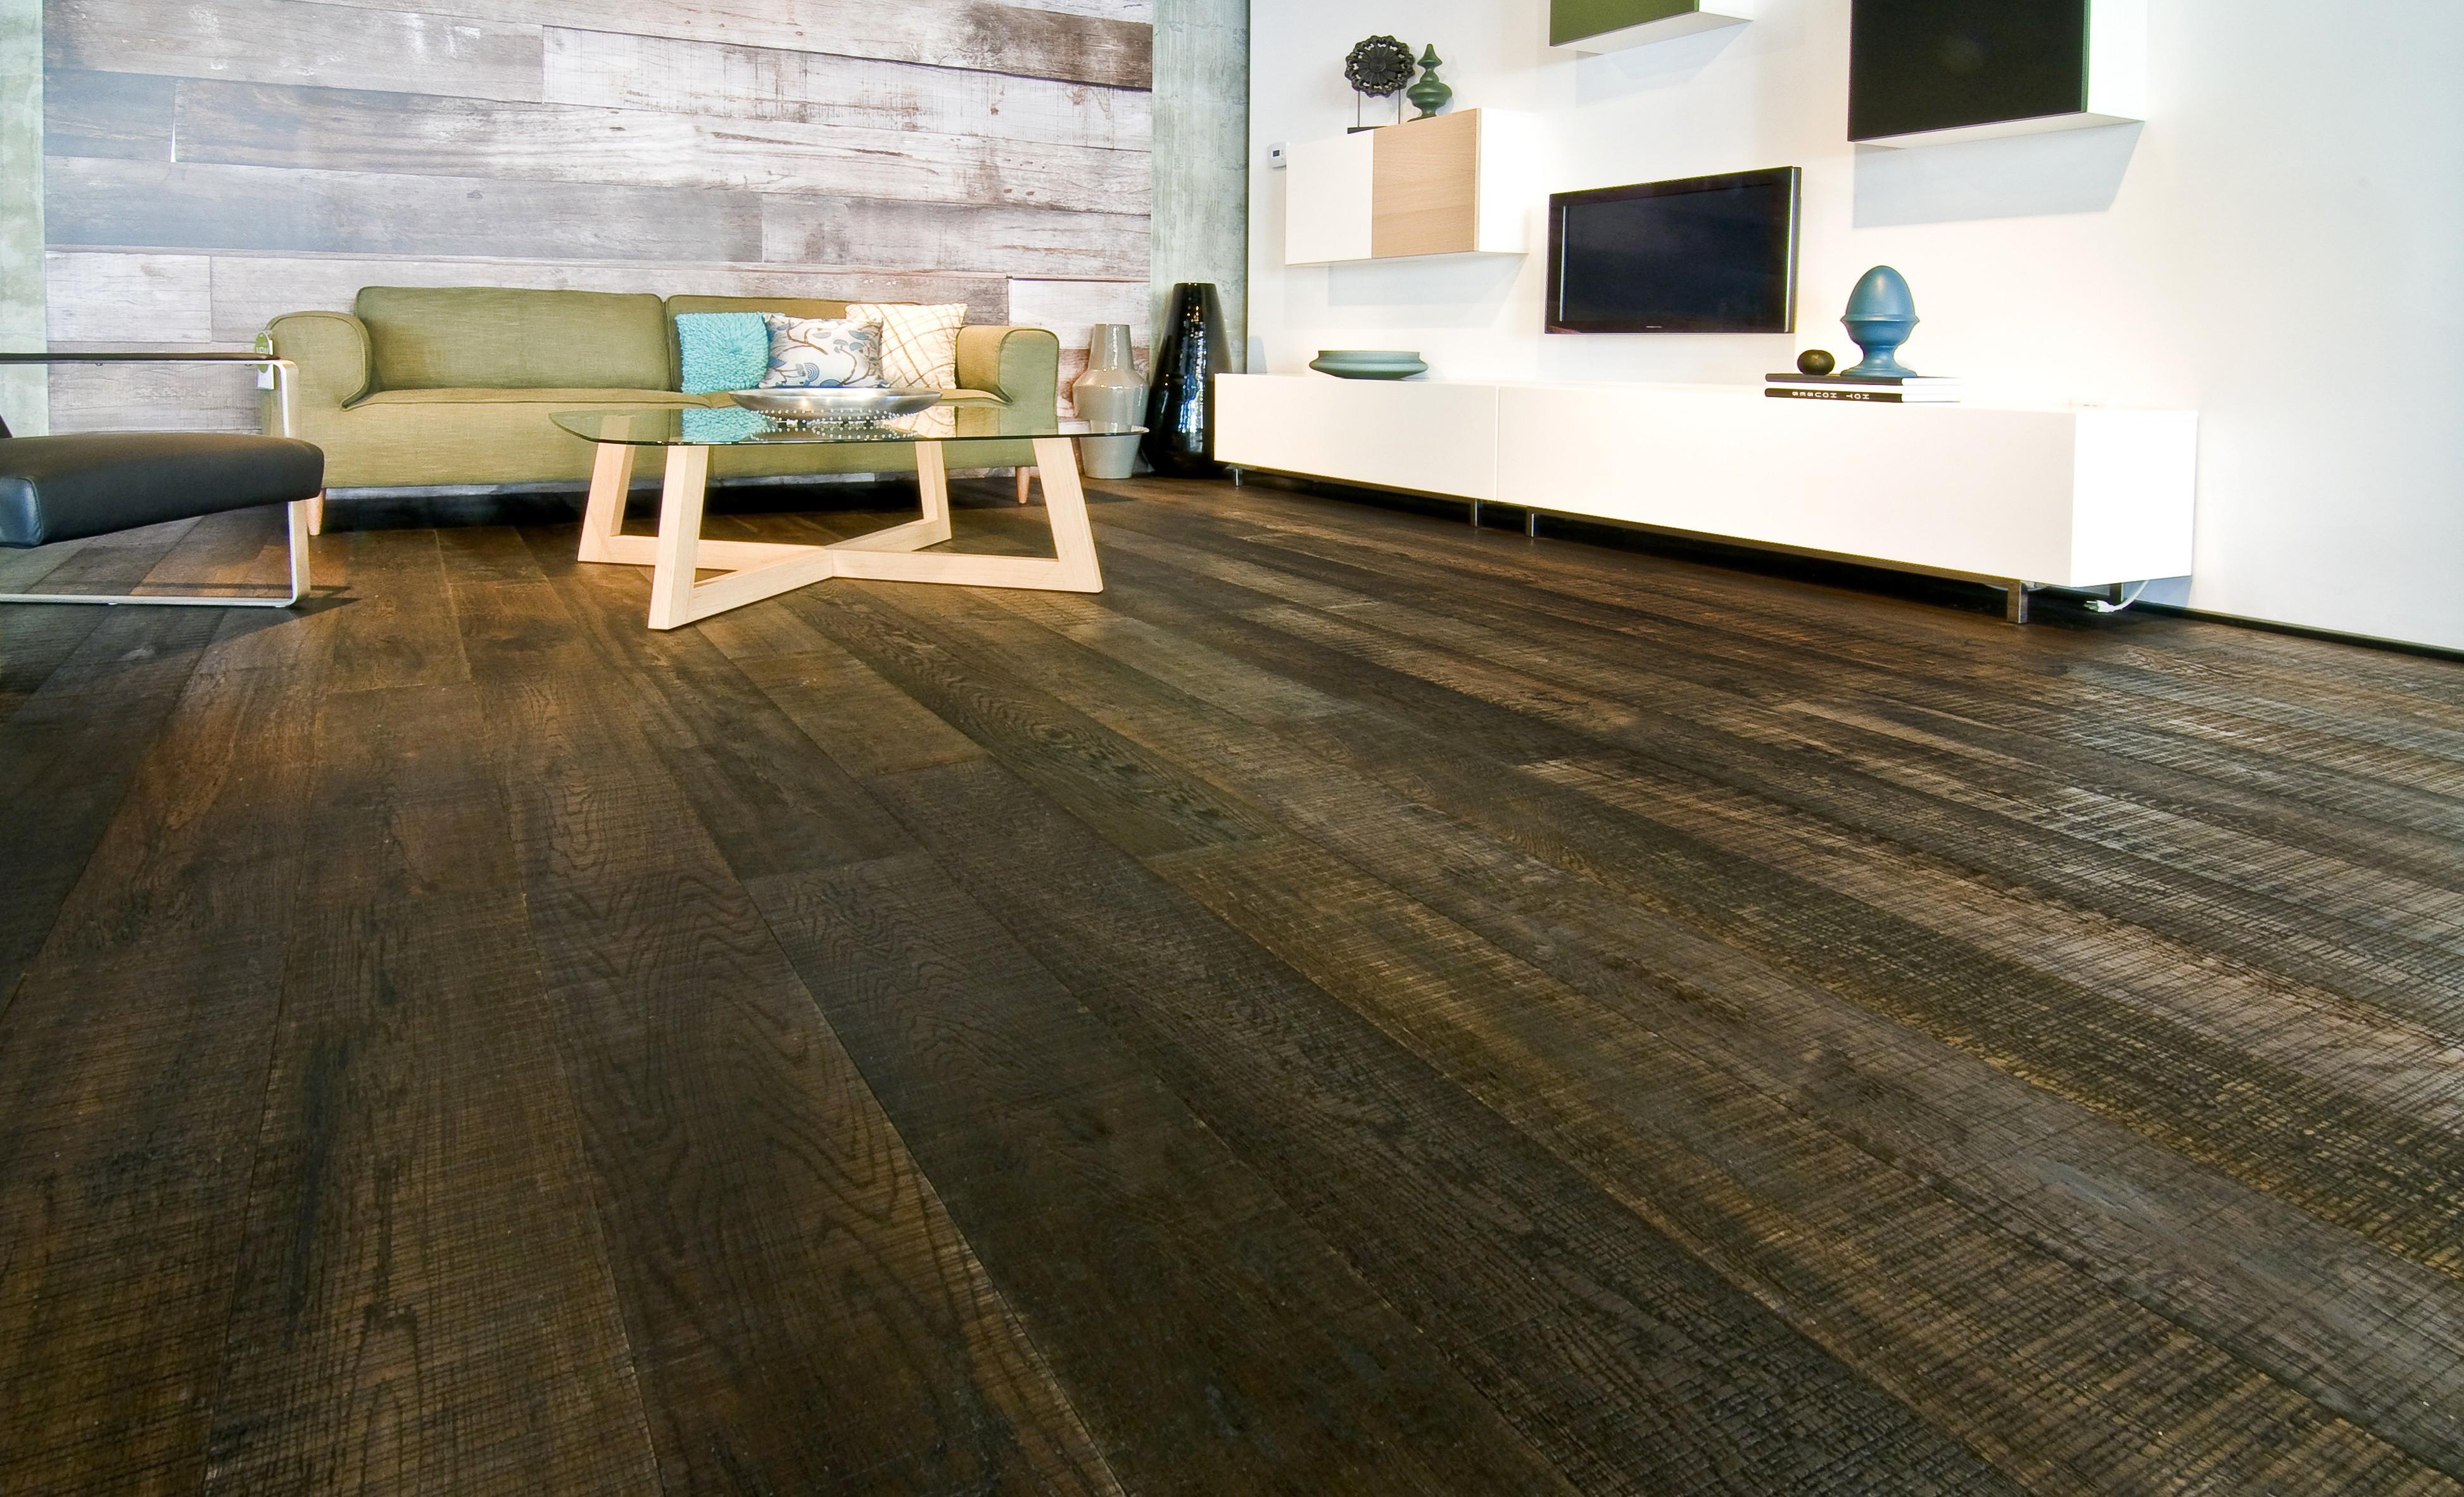 vinyl tile hardwood flooring of painting laminate wood floors new pierce flooring where to buy with regard to painting laminate wood floors new pierce flooring where to buy hardwood flooring inspirational 0d